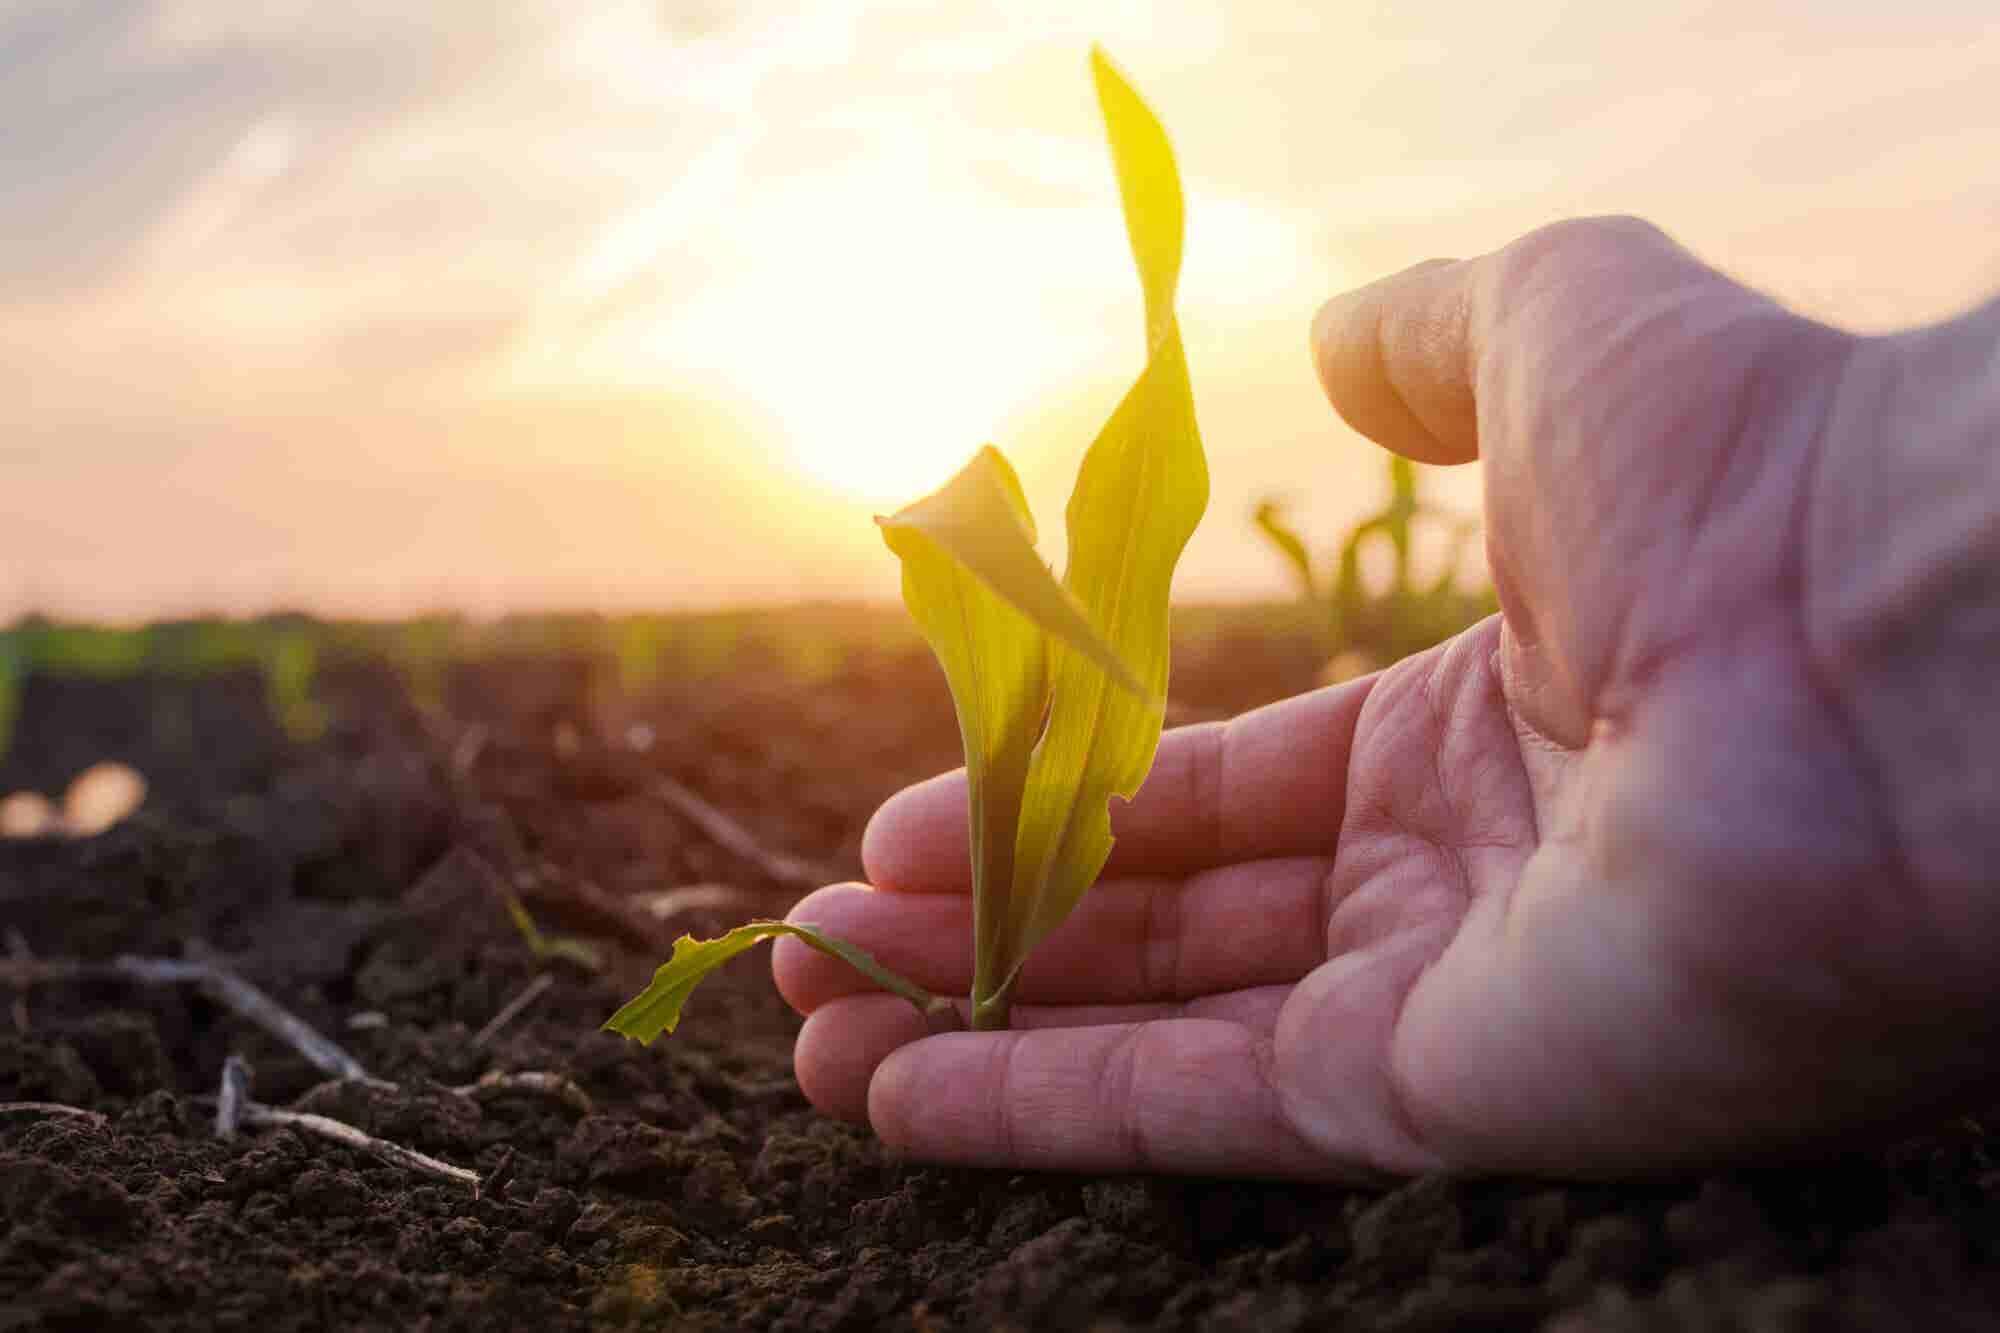 More Than Ever Entrepreneurs Must Maximize Human Flourishing